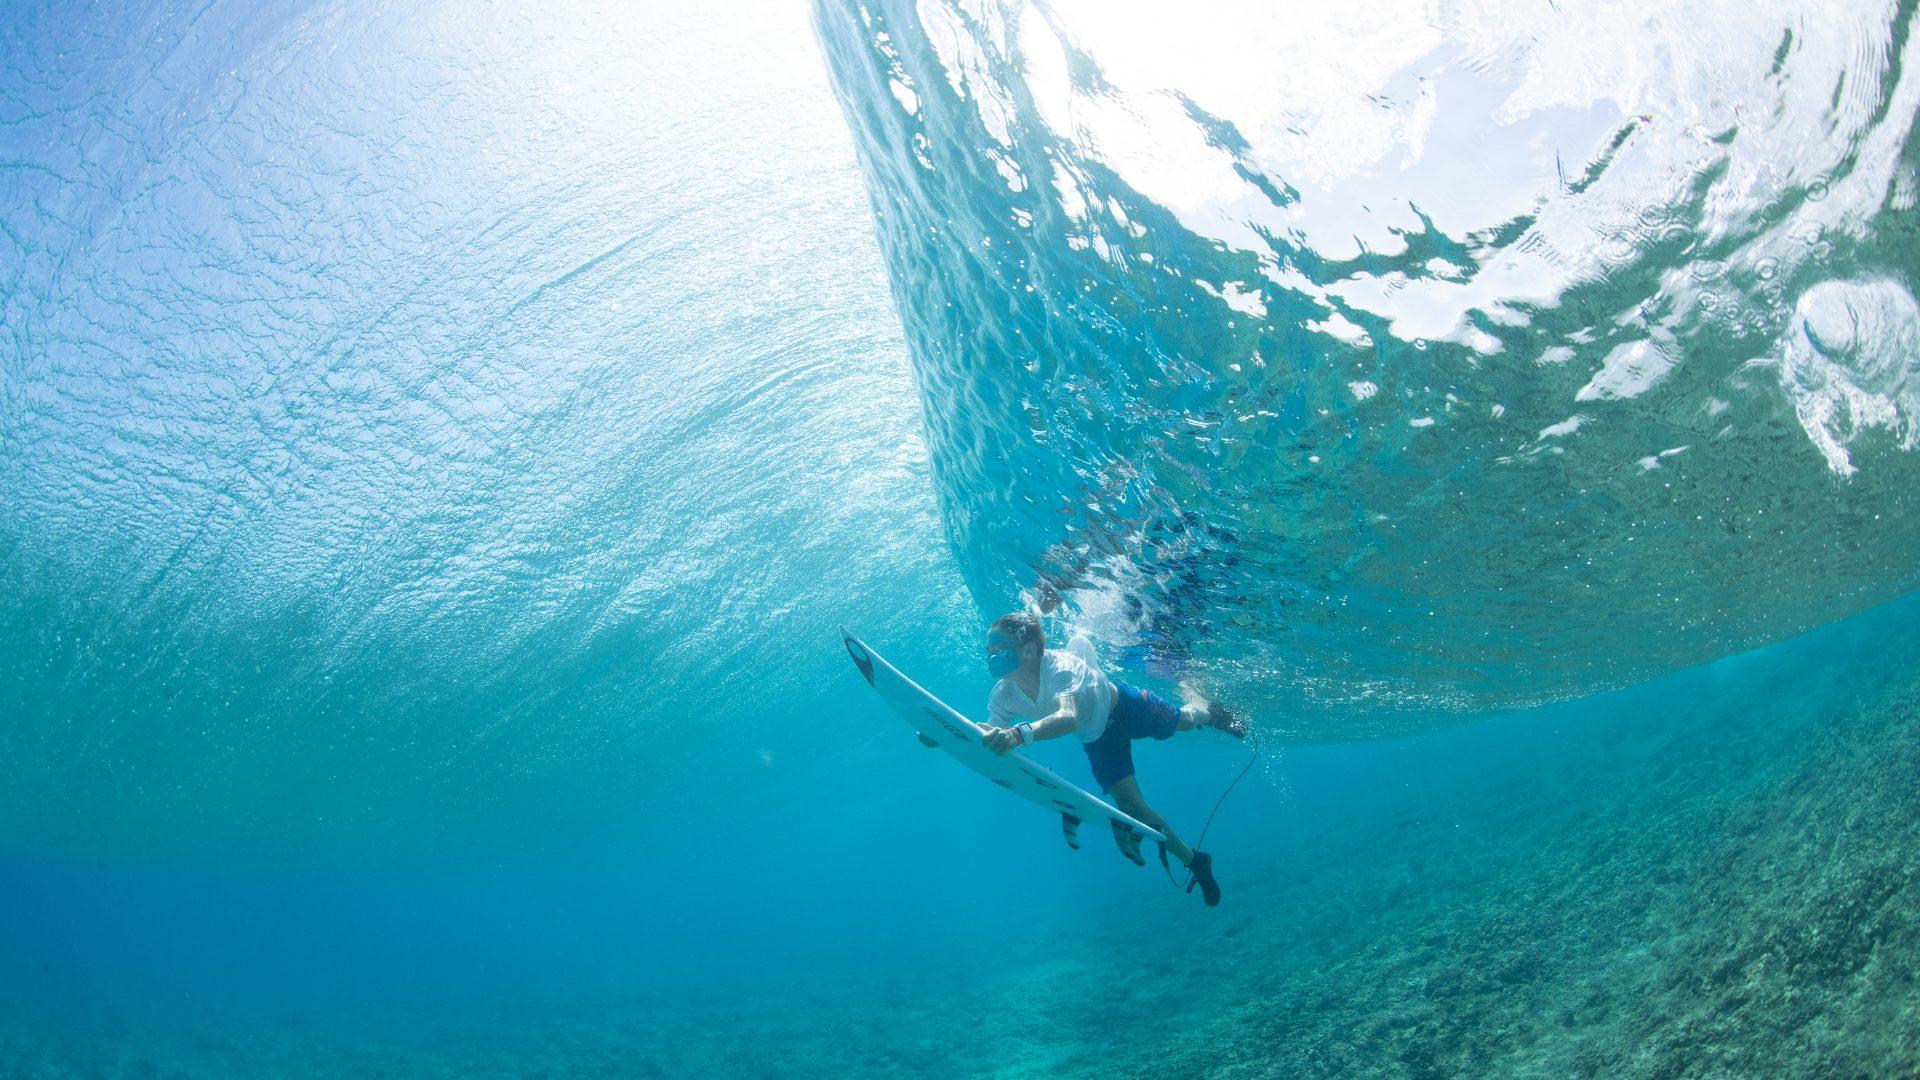 Soöruz Ocean Project 2nd Life Program Wetsuit Neoprene Recycle Black Is Green BIG Naturalprene Yulex